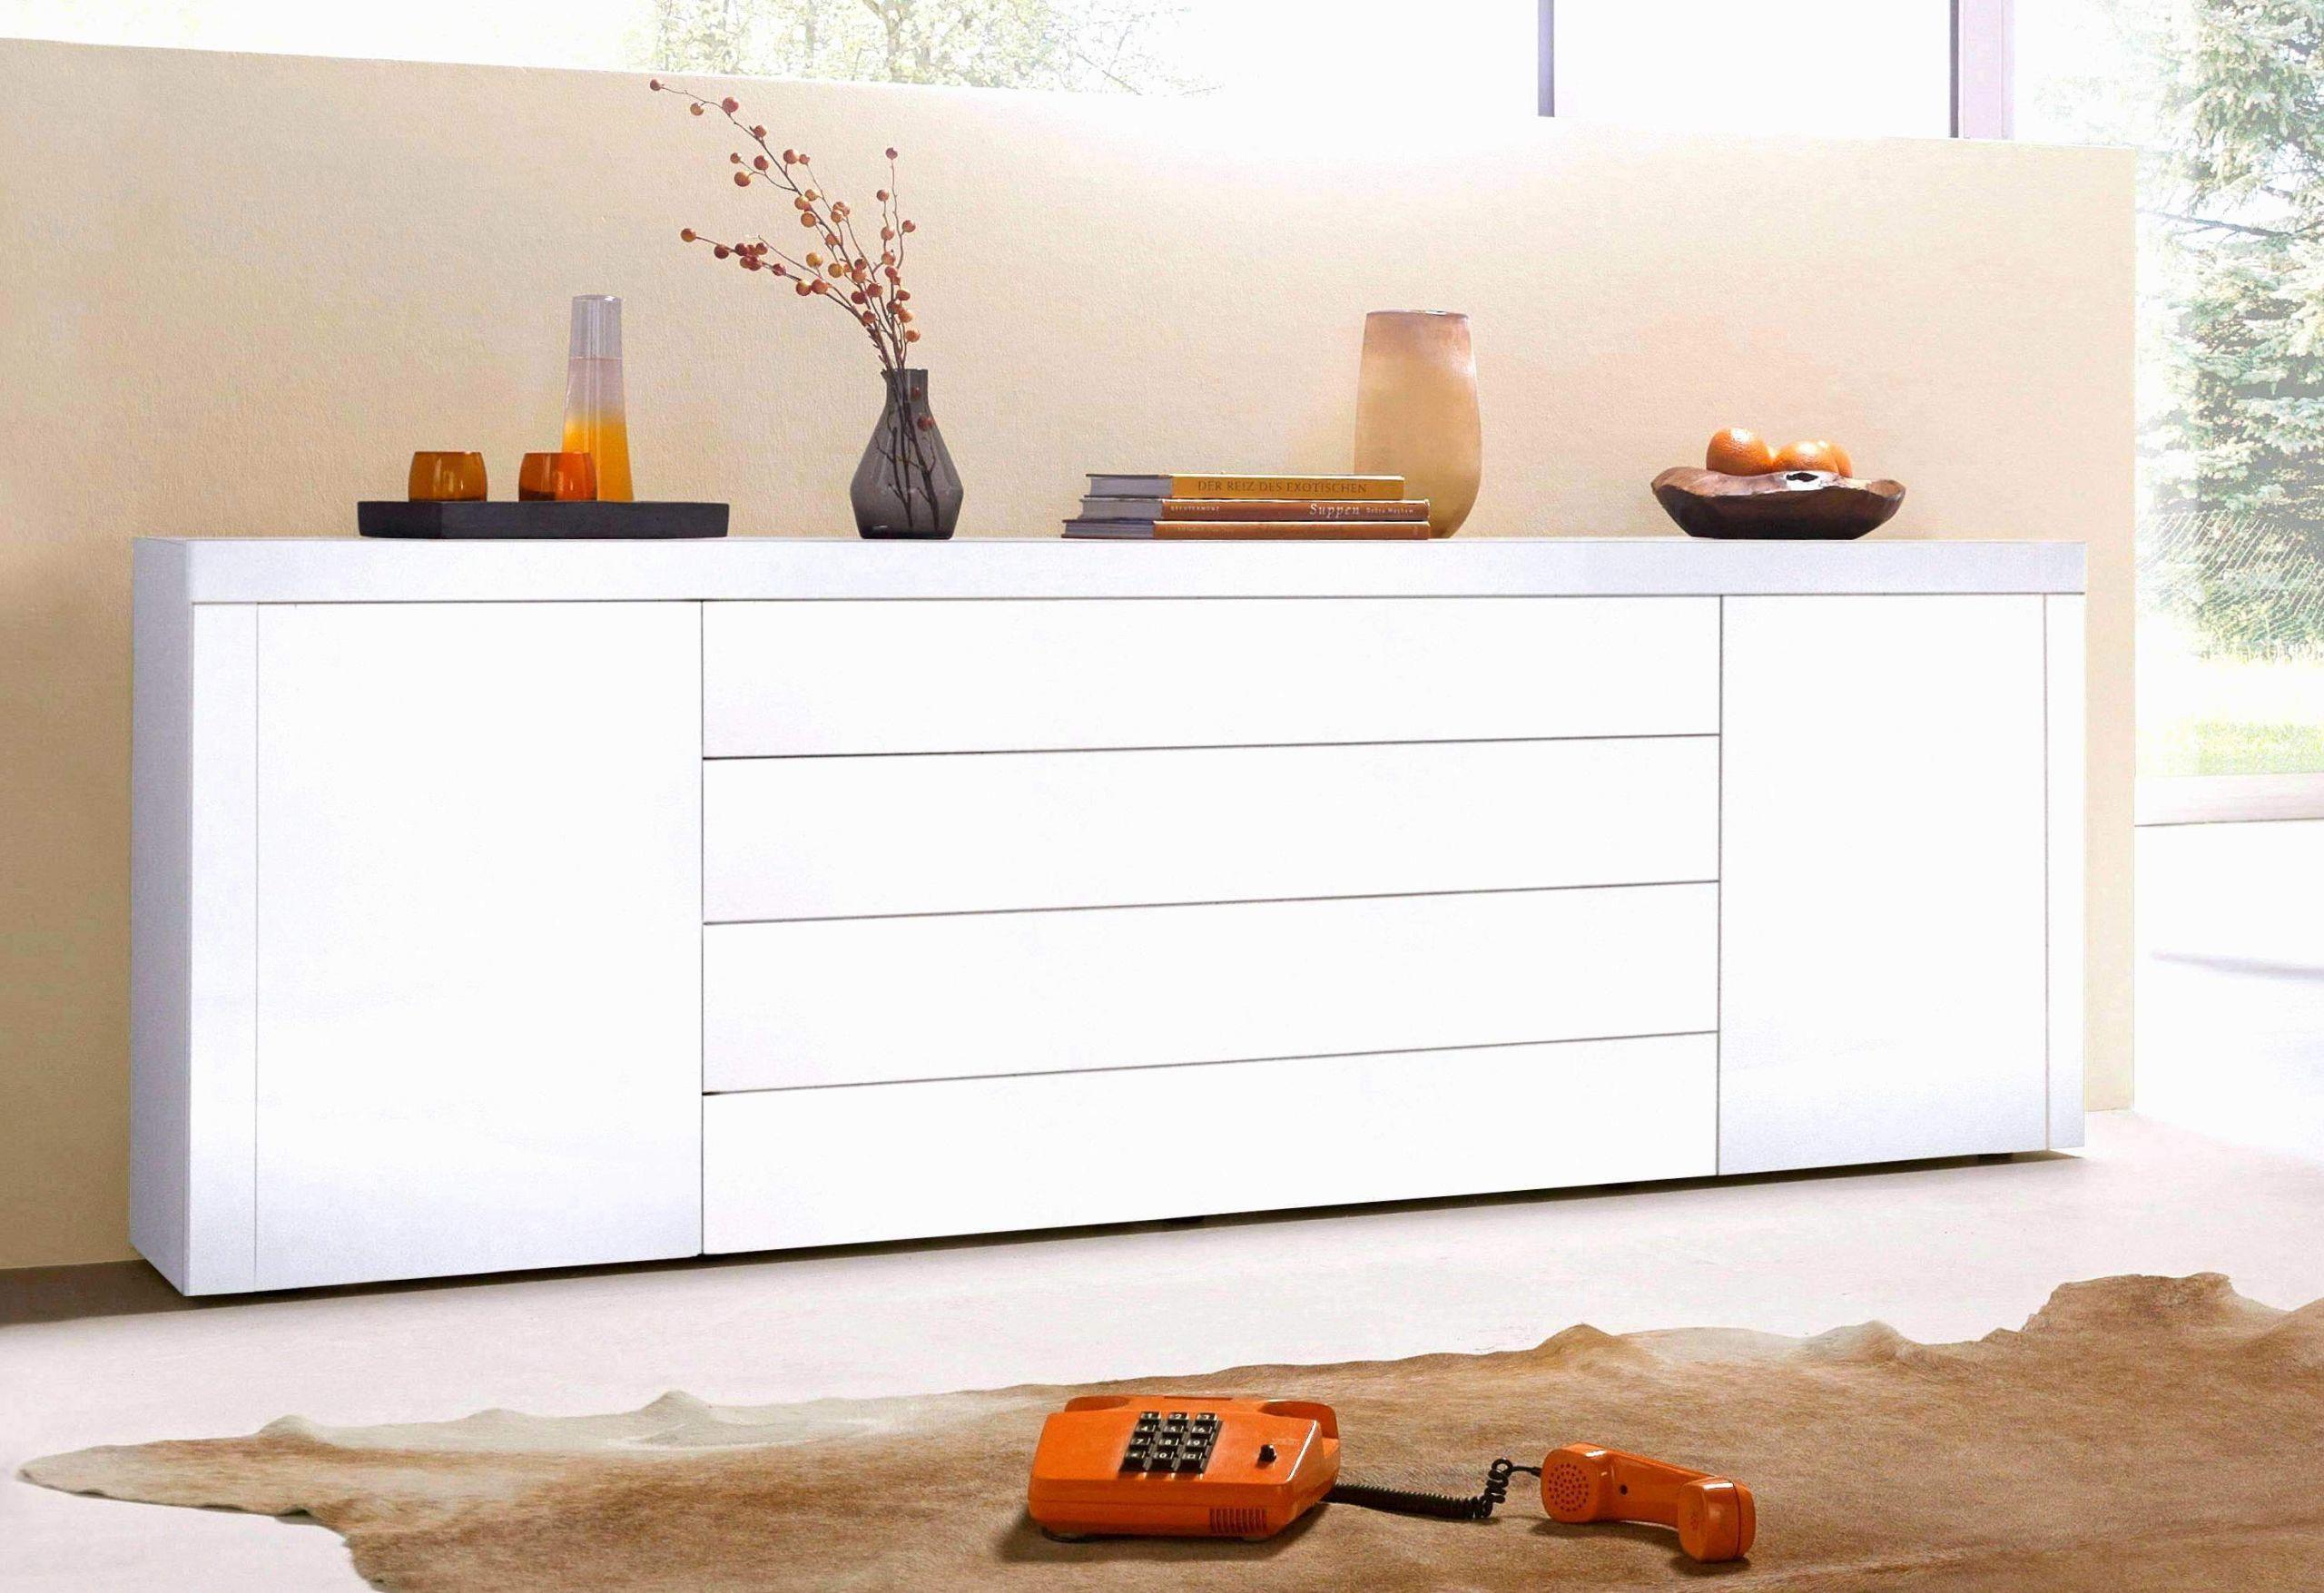 kommode wohnzimmer elegant kommode fur kuche neu best mobel fur wohnzimmer of kommode wohnzimmer